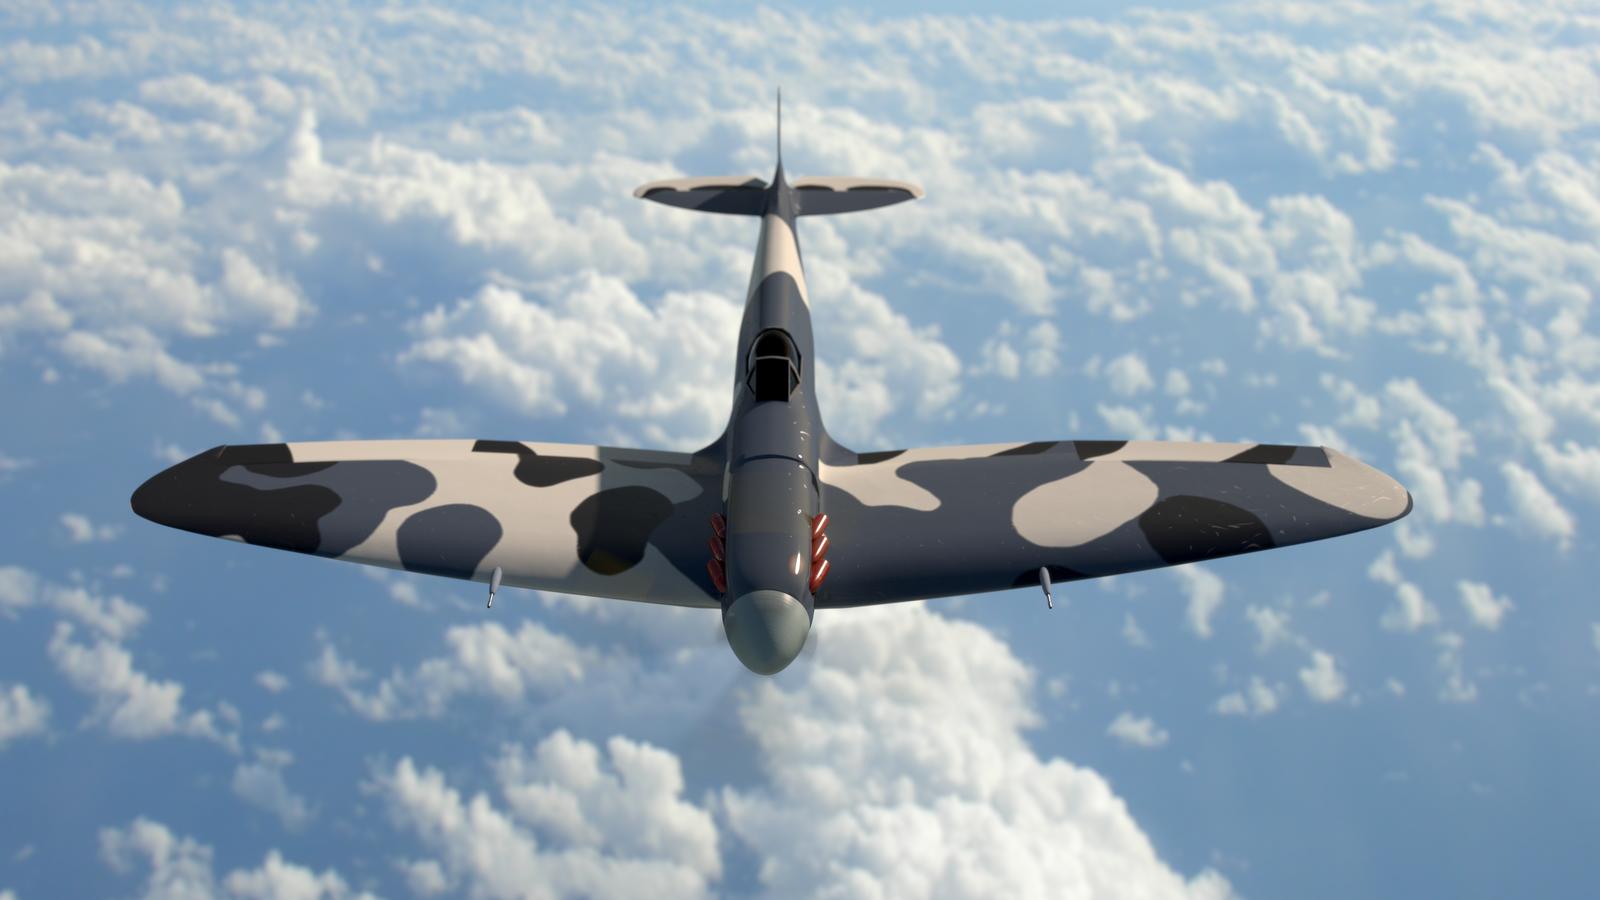 Spitfire by Nasenbaerr